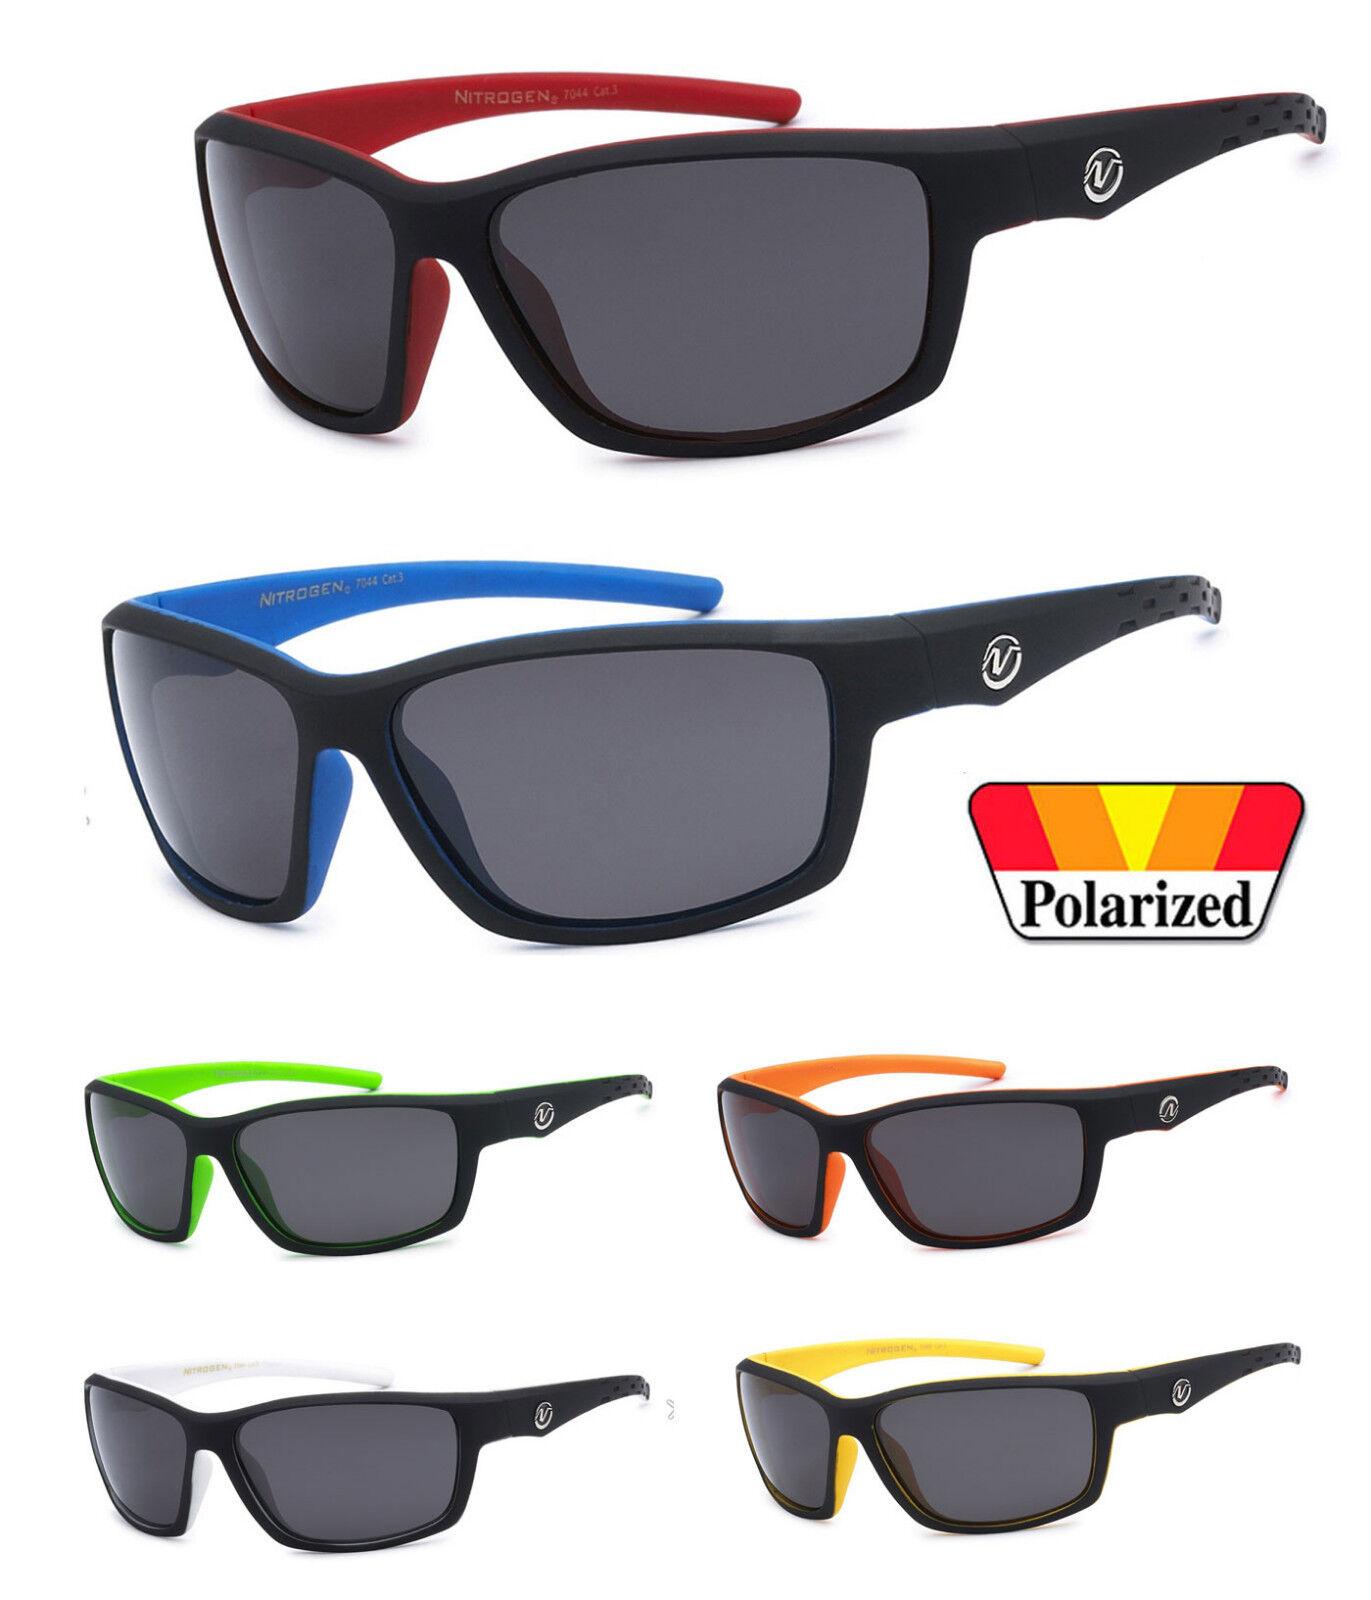 3507ea03af1 Nitrogen Polarized Sunglasses Mens Sport Running Fishing Driving Glasses  NT02